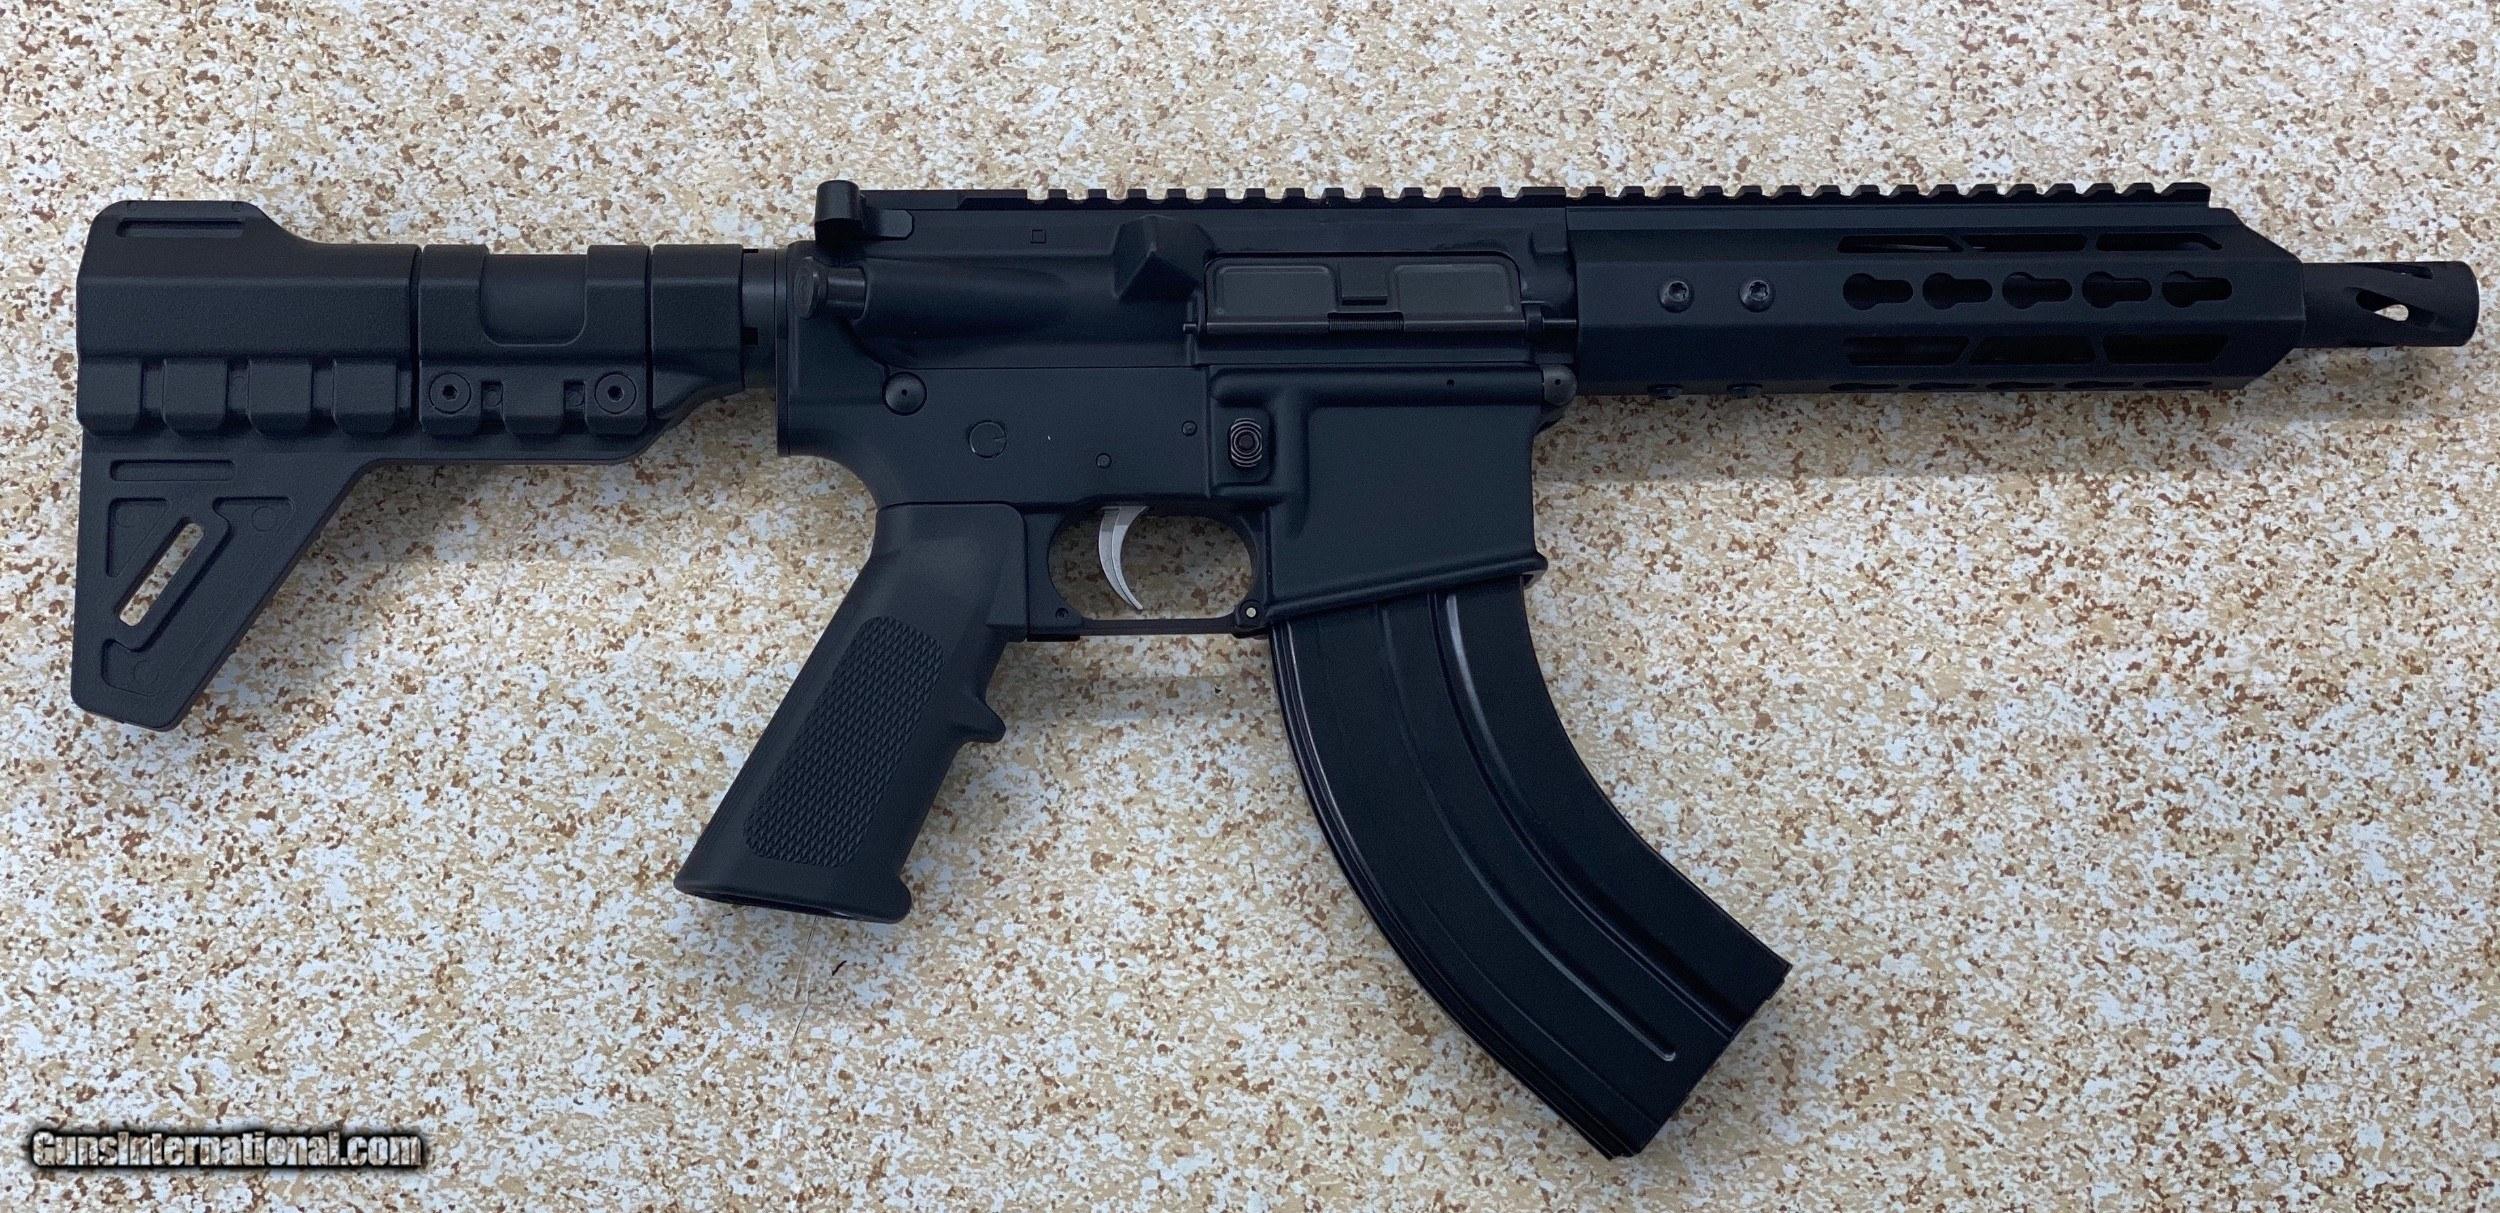 New Usaccuracy 7 62x39 Ar 15 Pistol With 7 5 Barrel